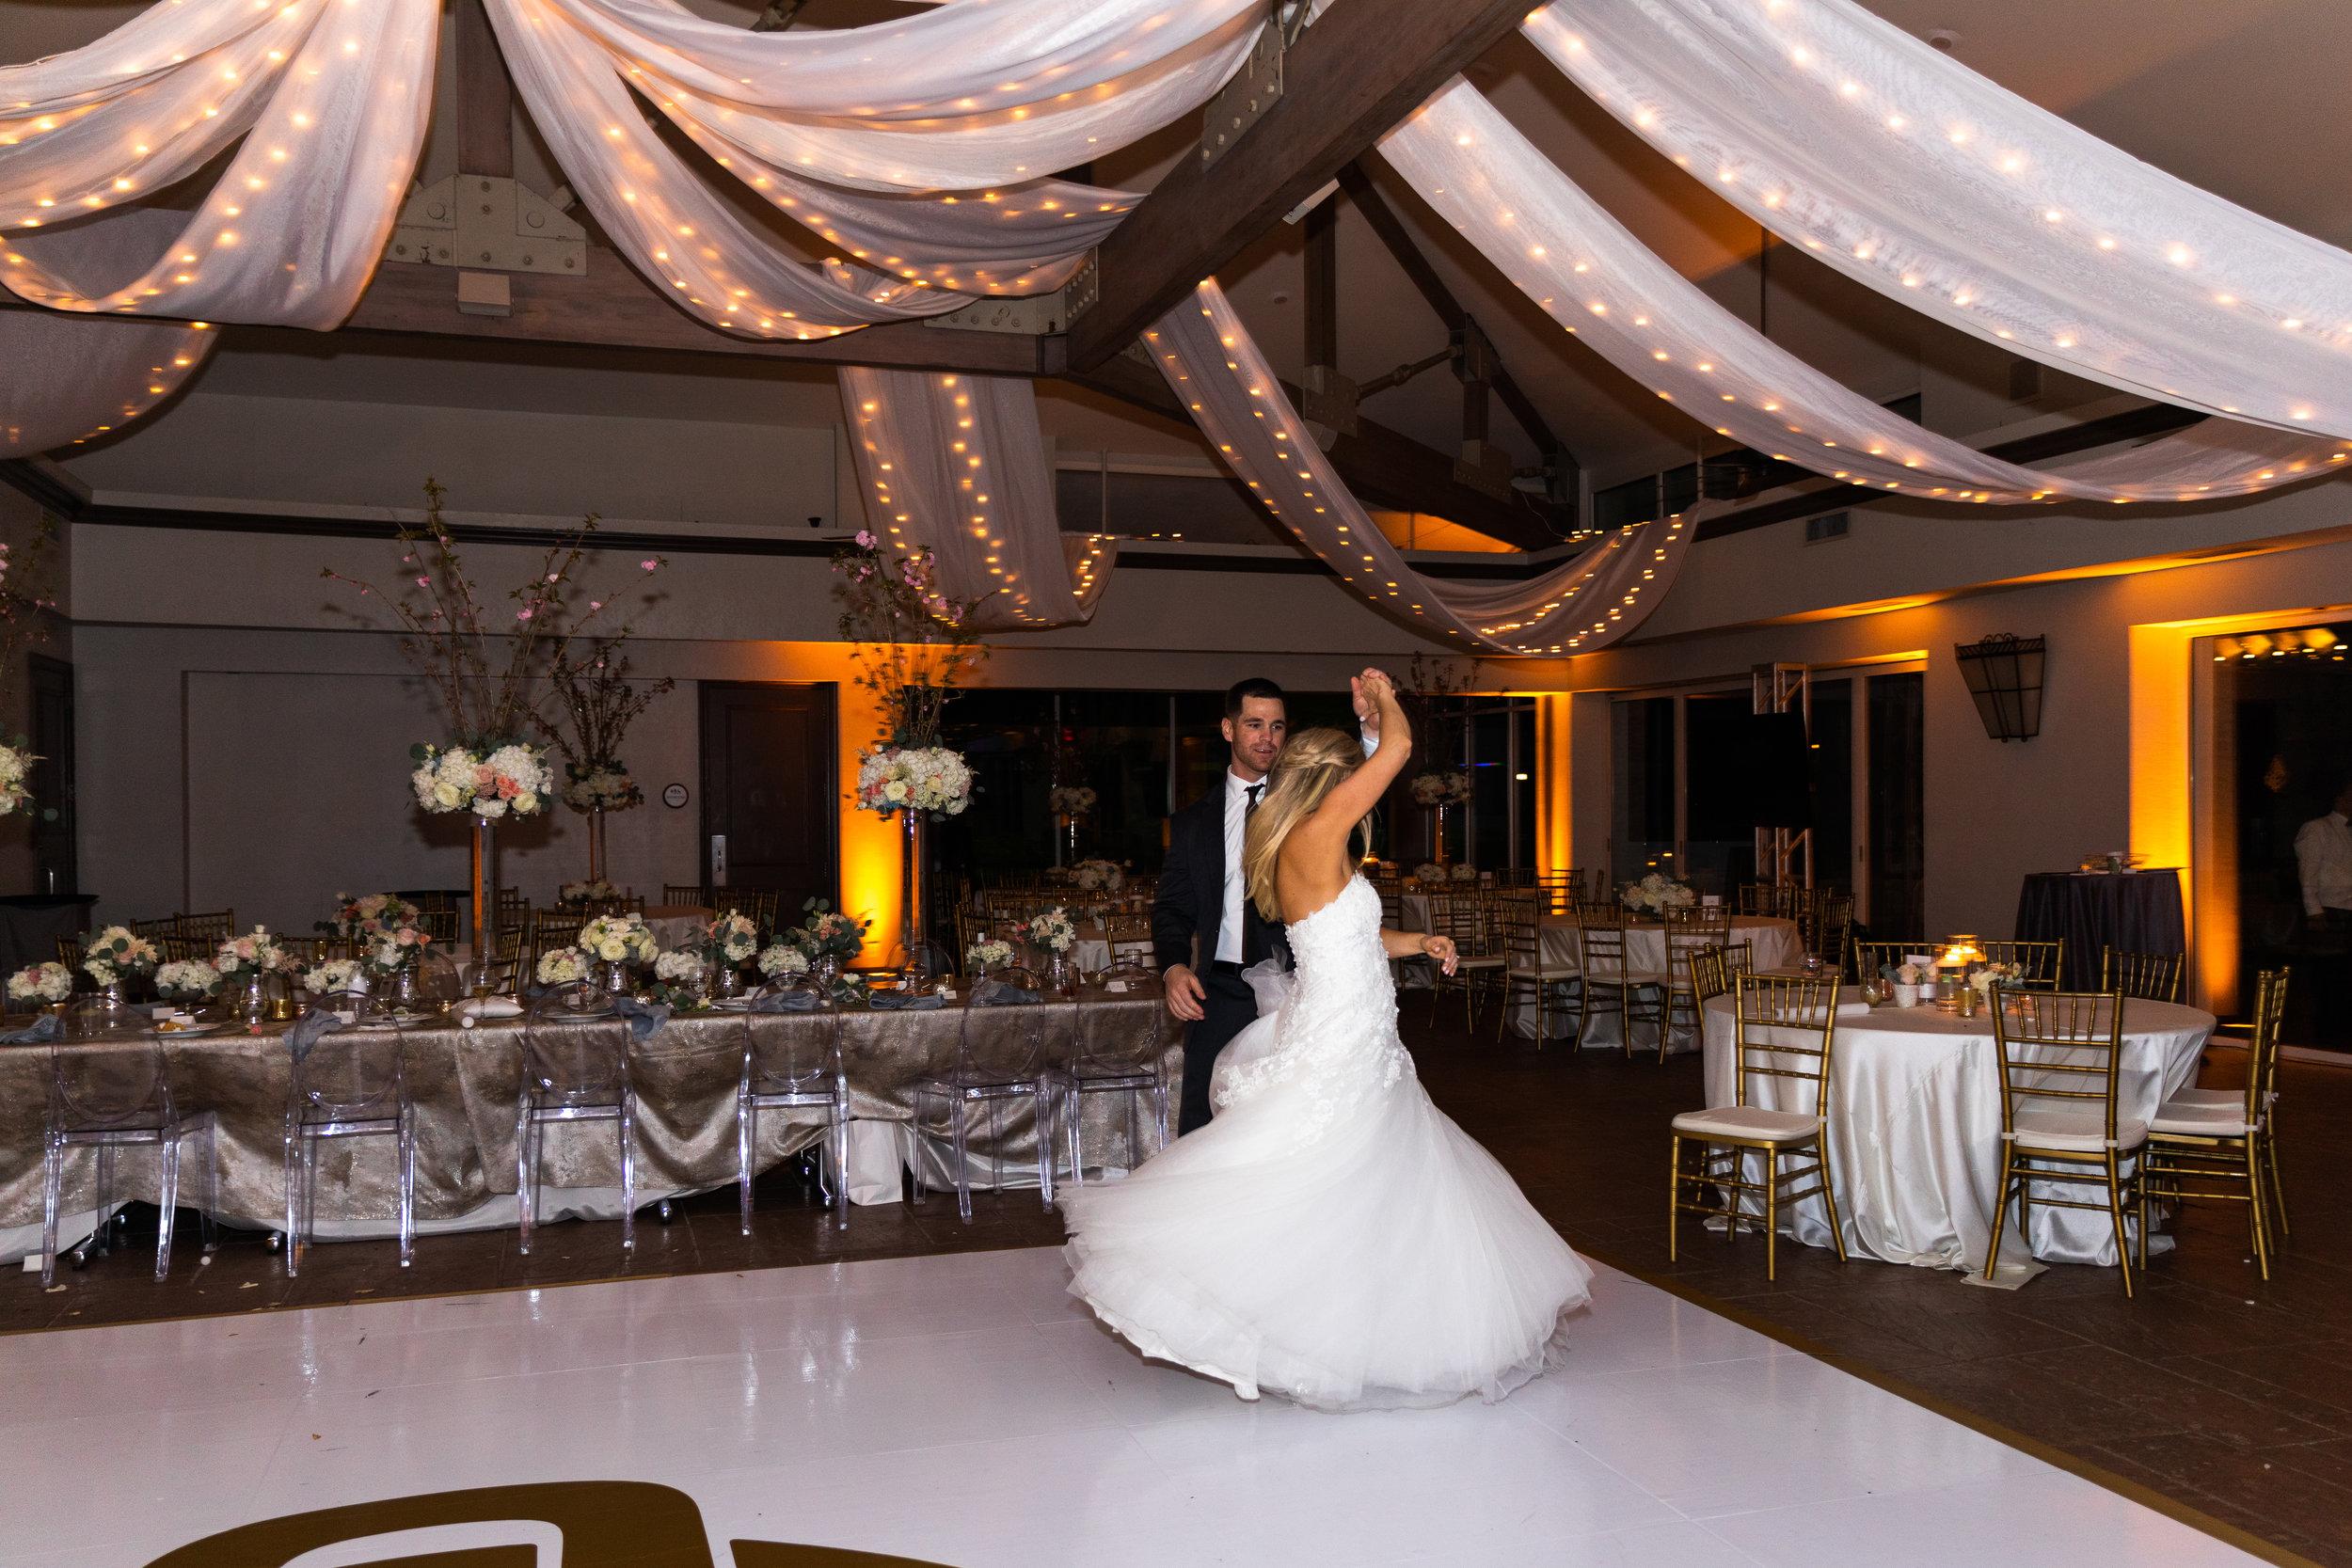 DFW Wedding Planner - Caroline + Jeff at The Four Seasons Hotel Wedding - Allday Events - 205.jpg